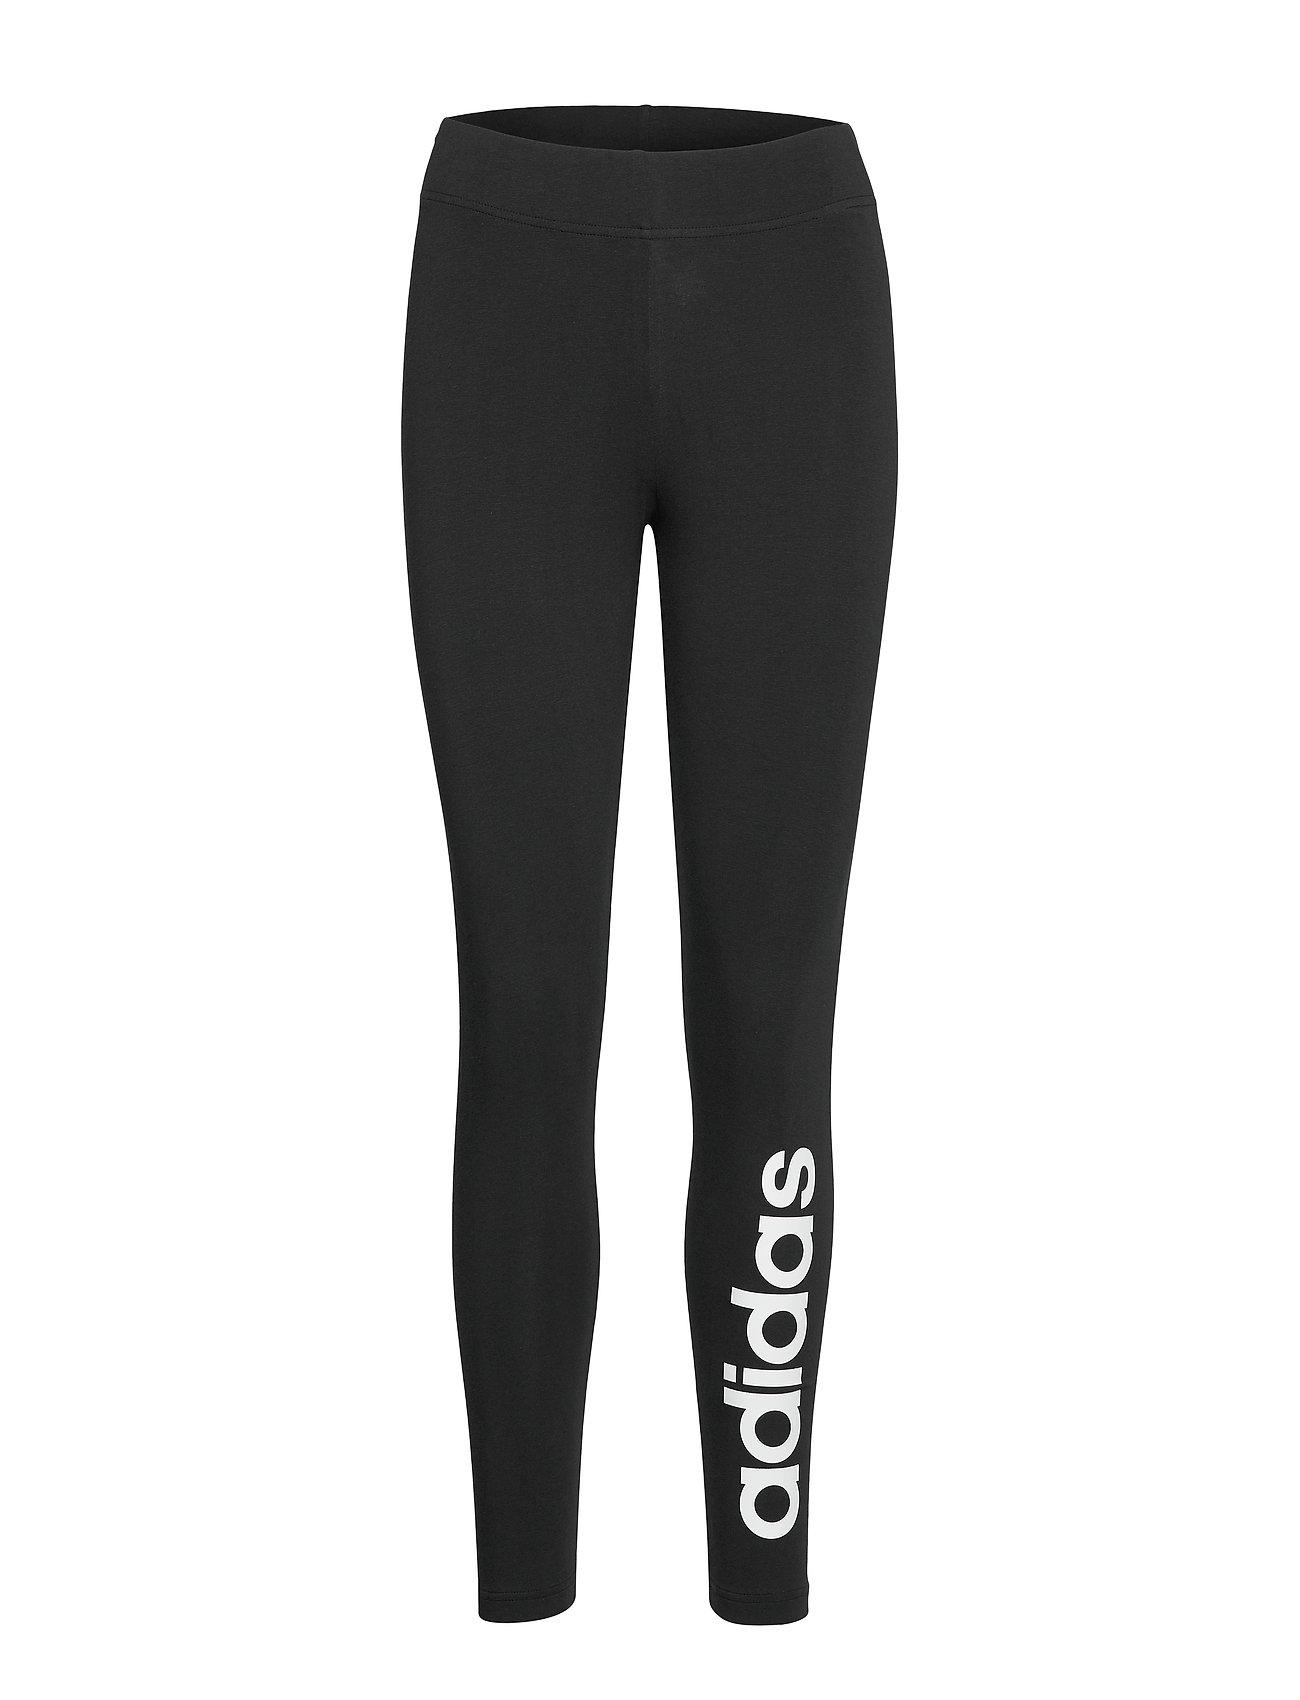 adidas Performance W E LIN TIGHT - BLACK/WHITE